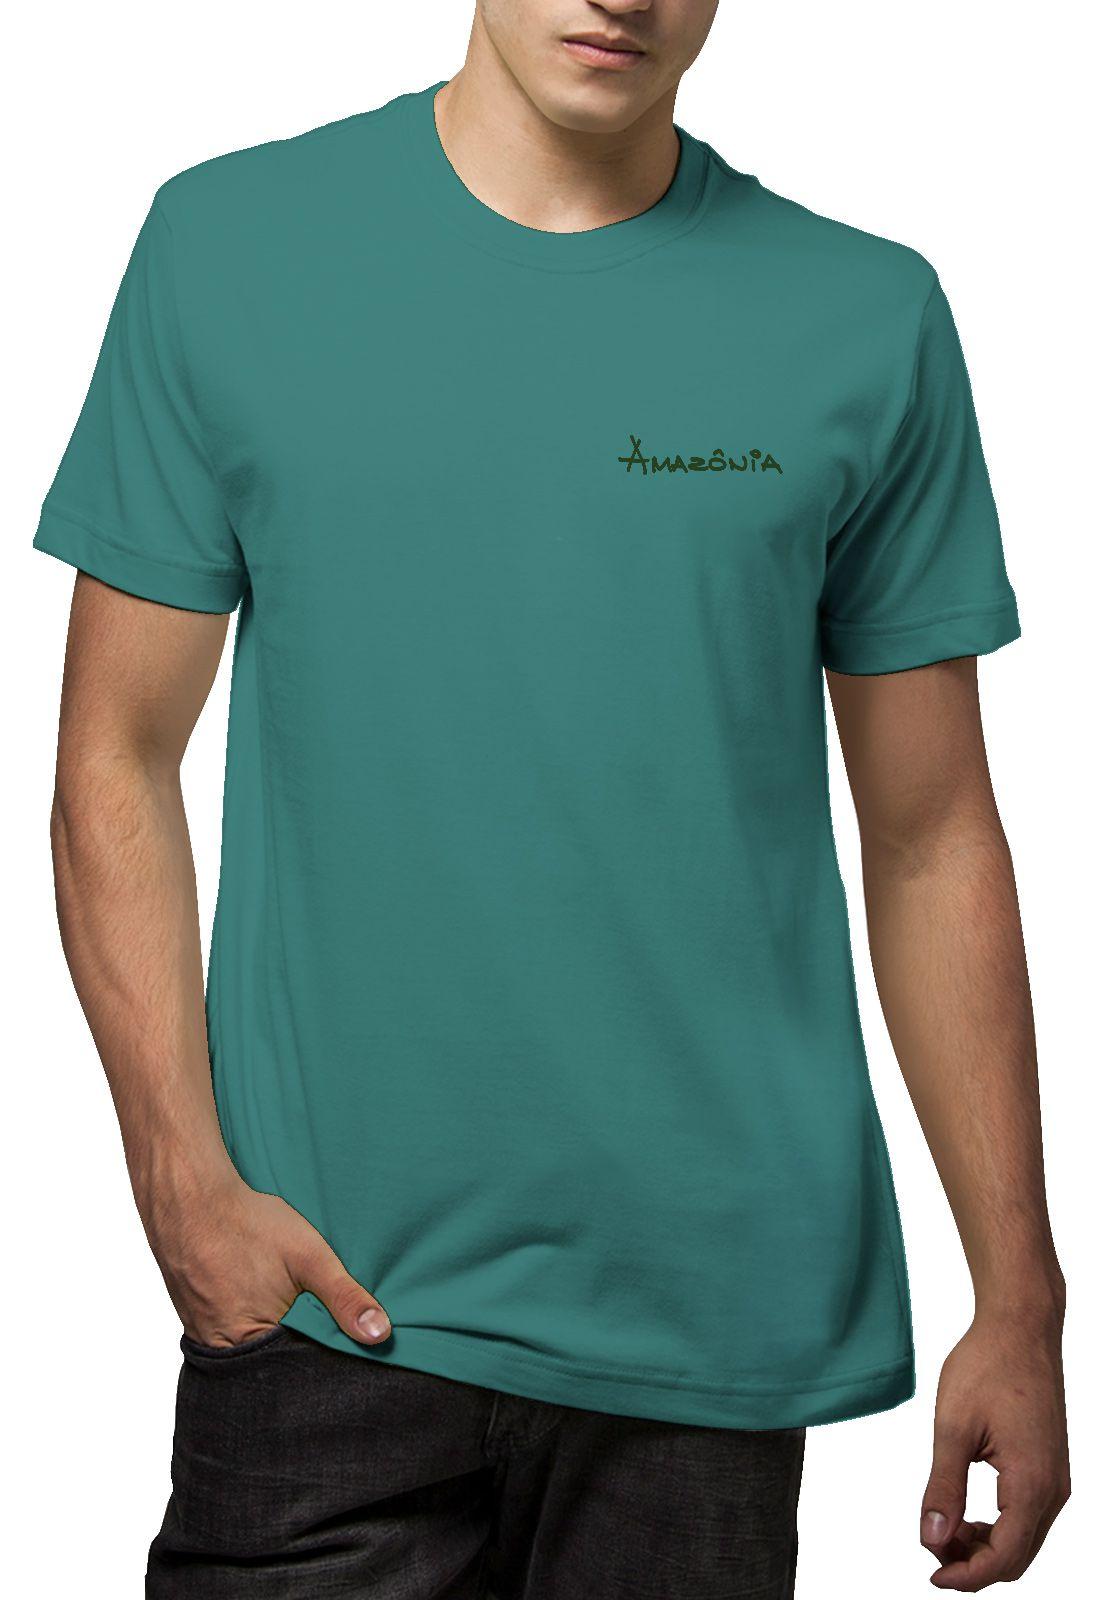 Camiseta Amazônia Folha Arte Gráfica - Azul